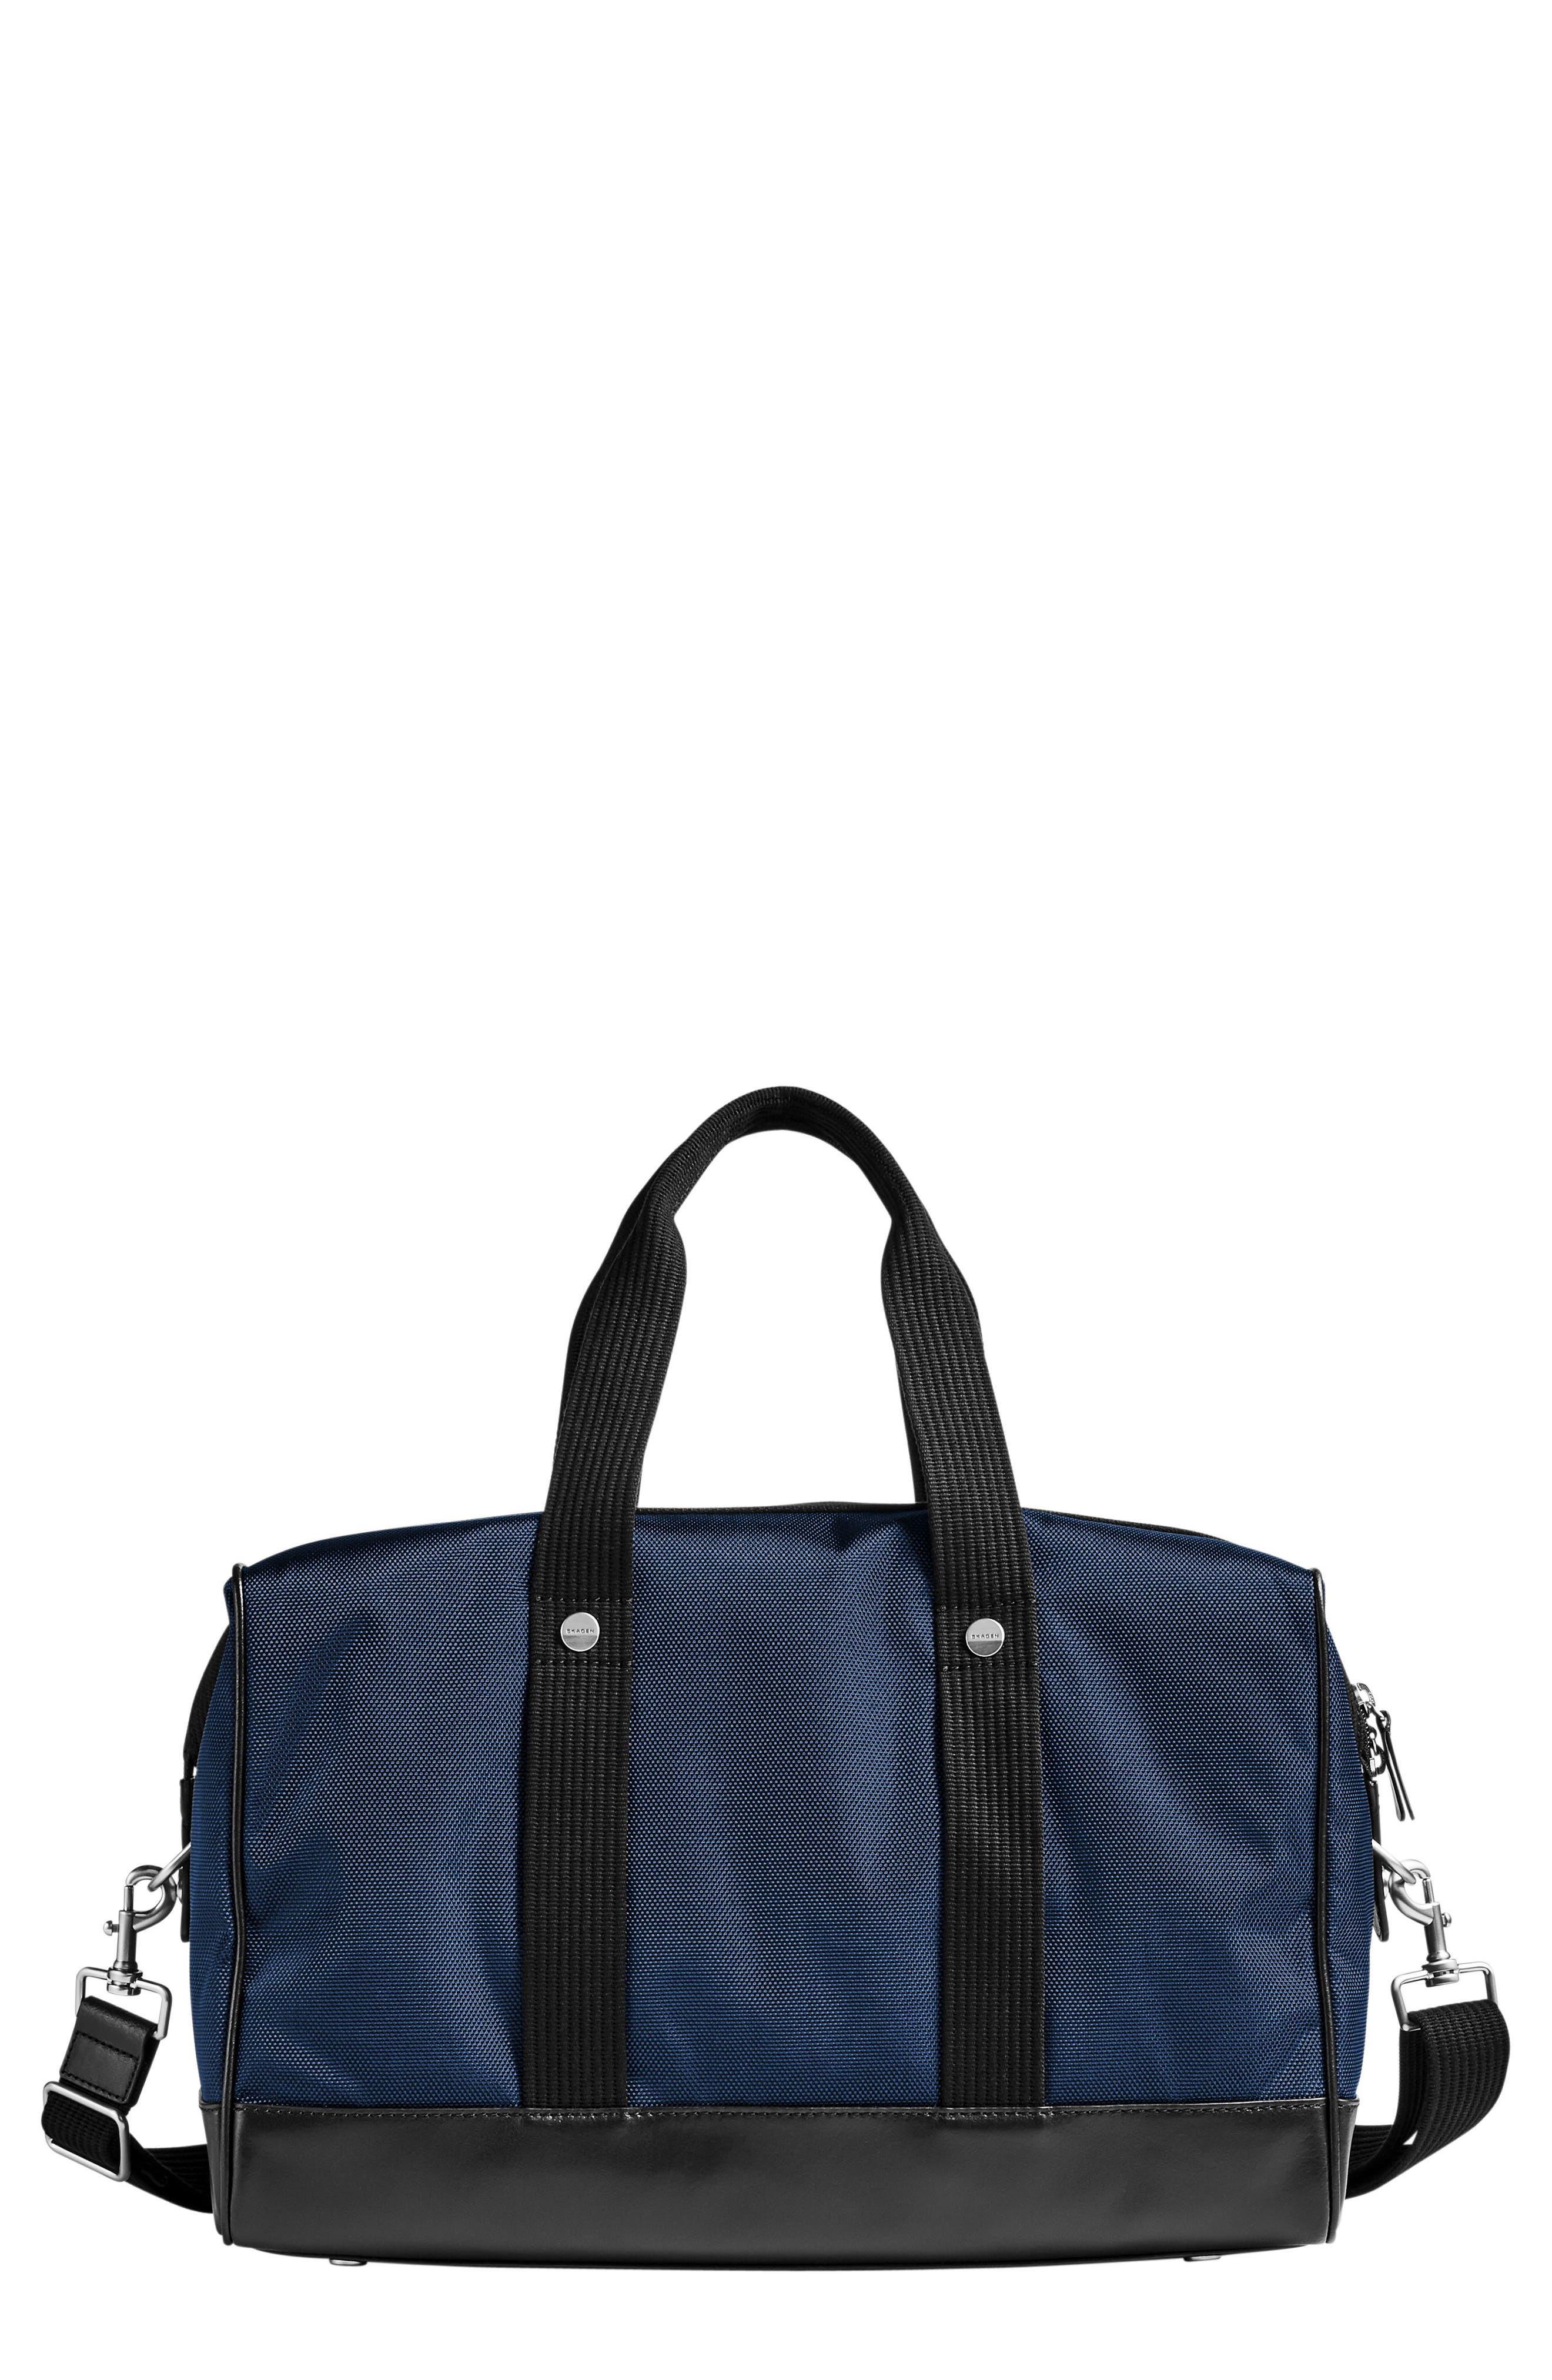 Skagen Krinsen Duffel Bag